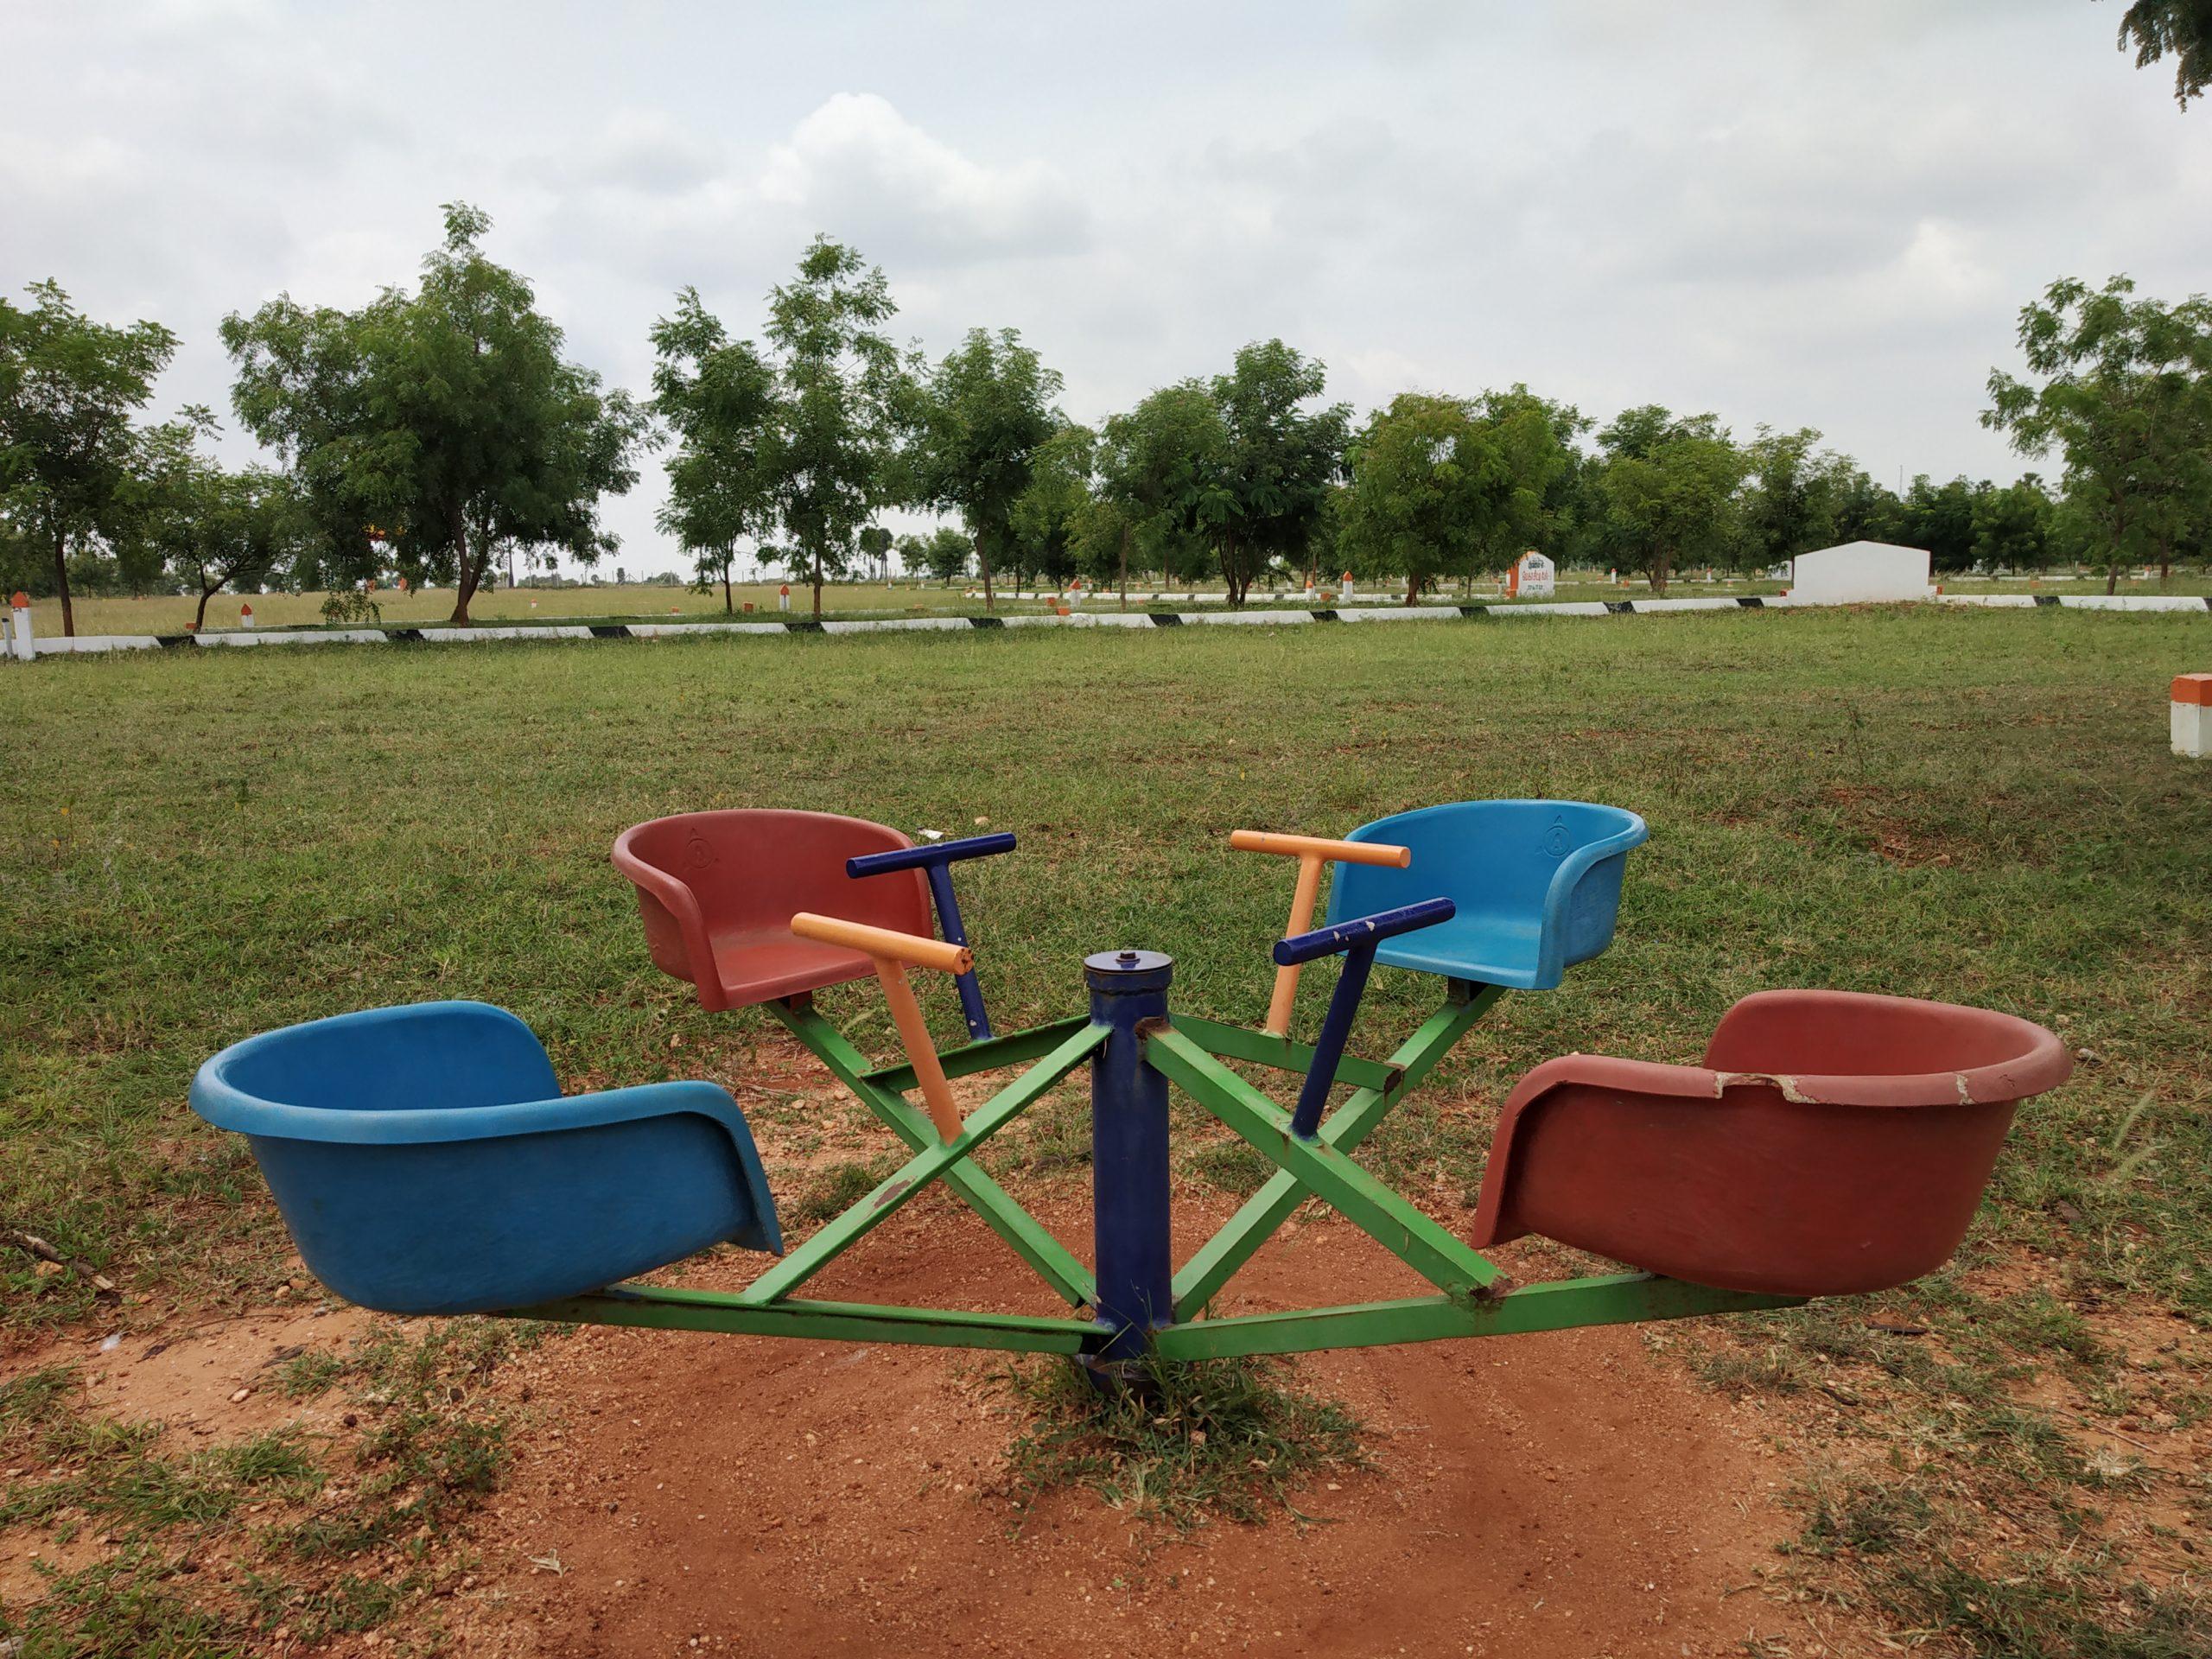 merry go round in a playground